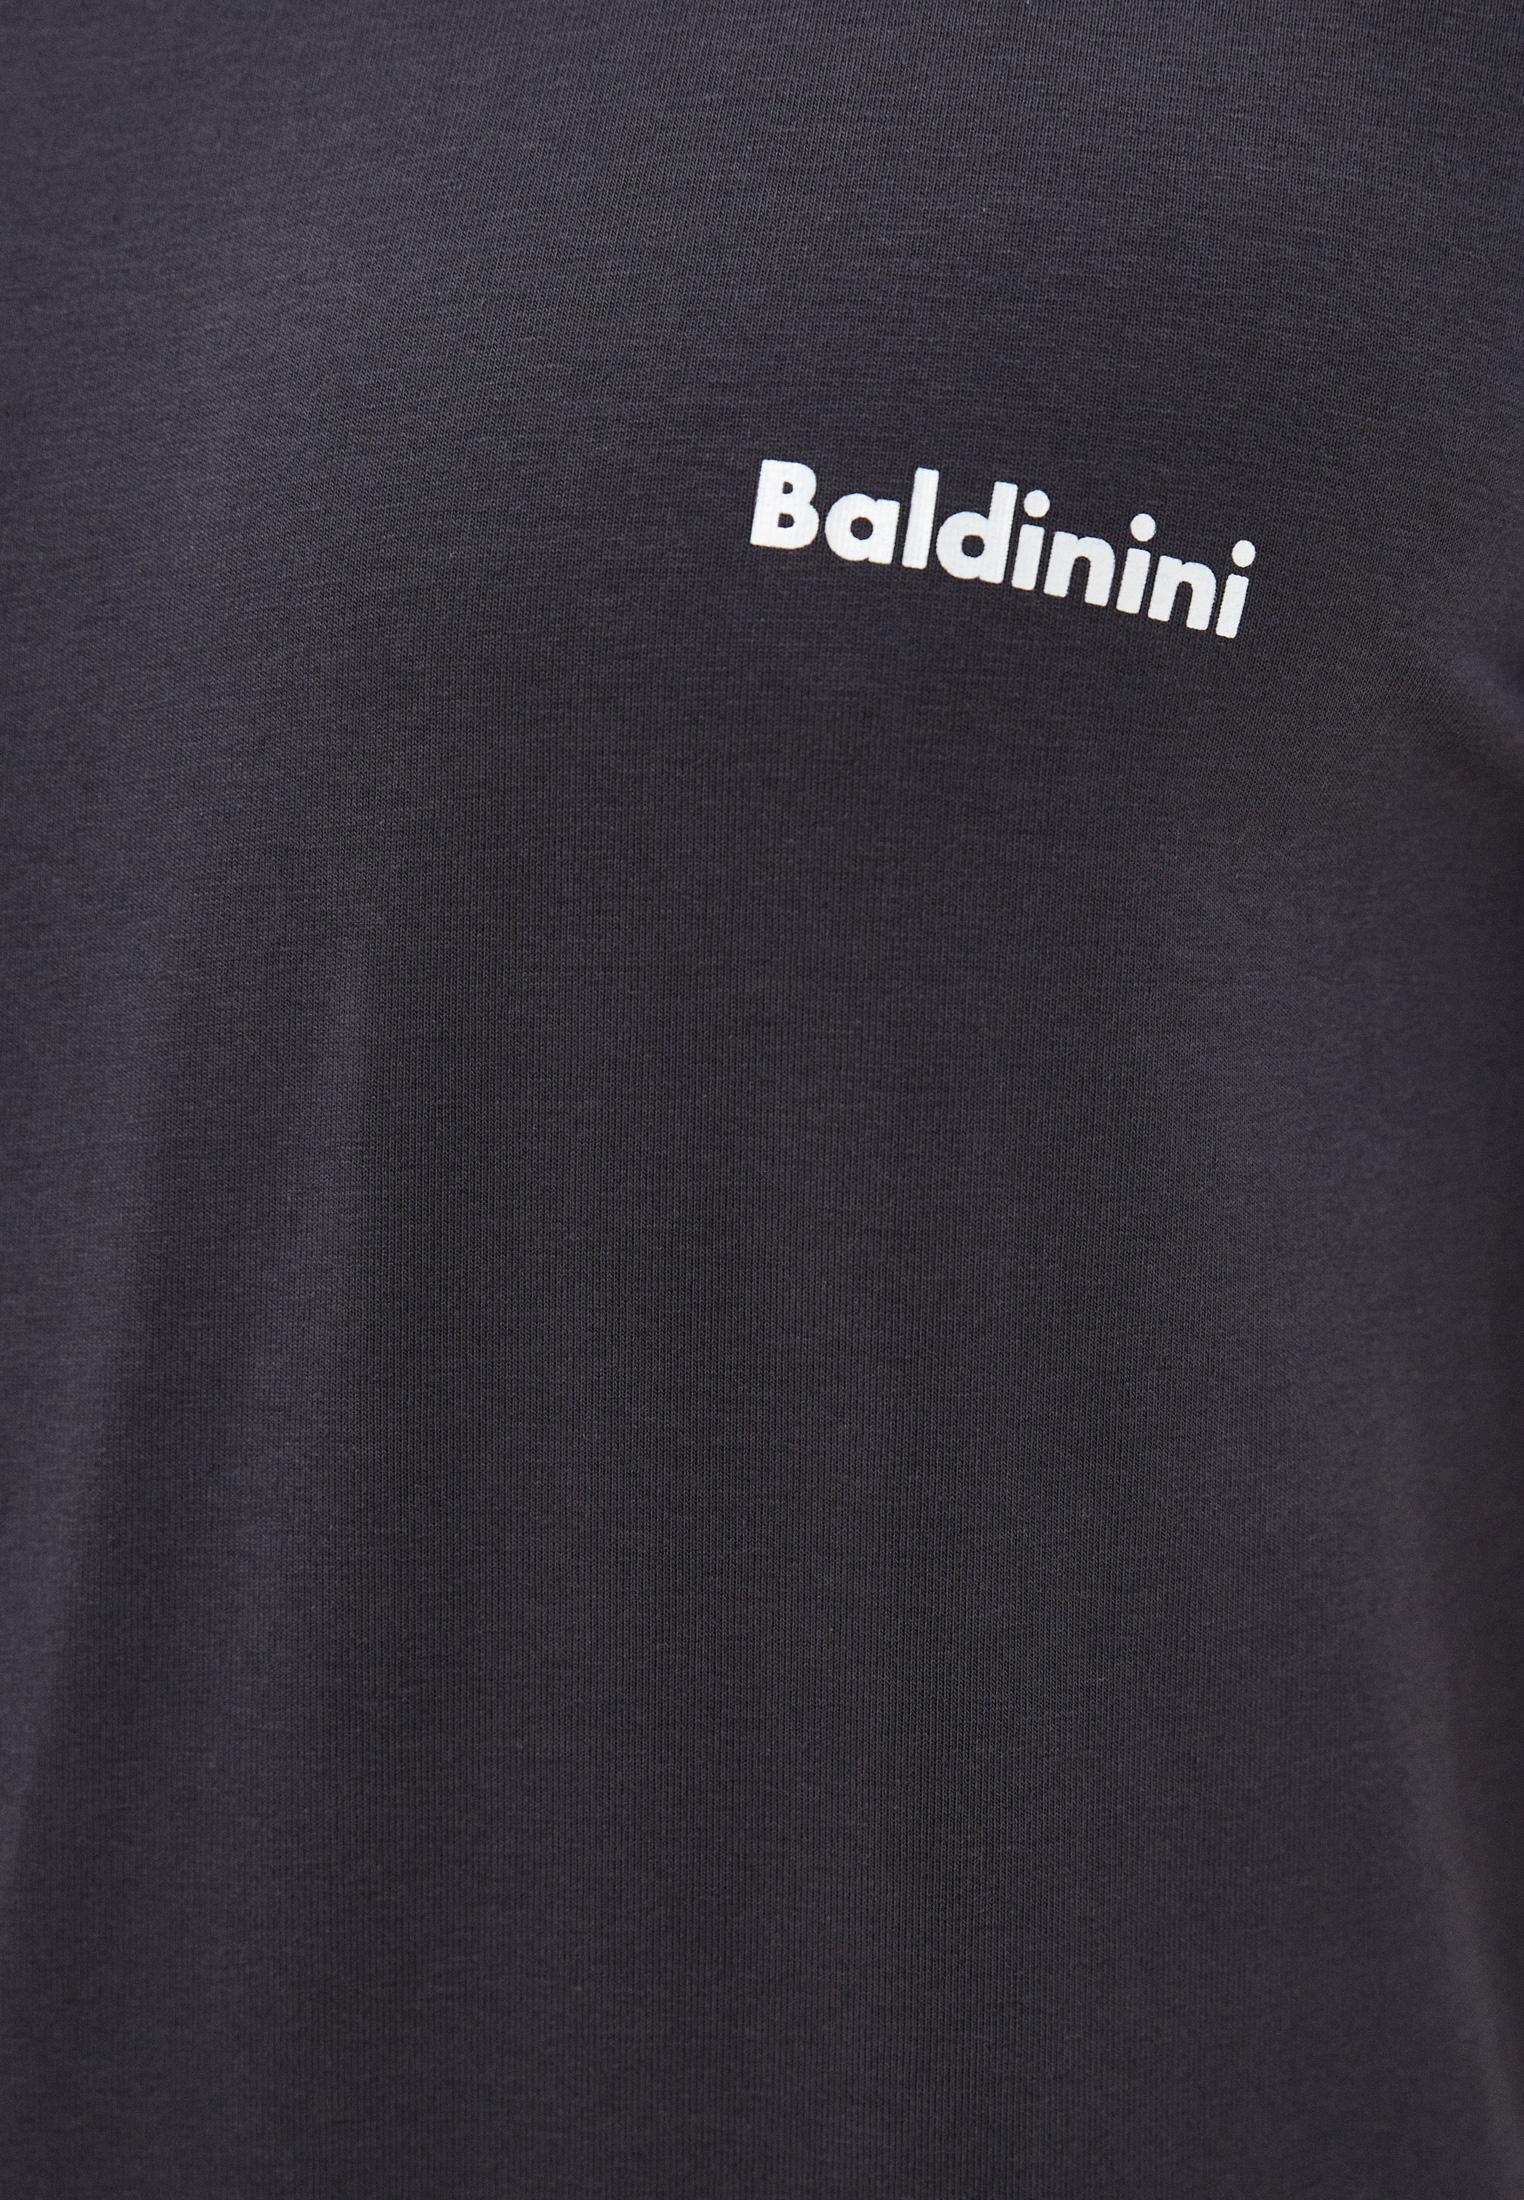 Мужская футболка Baldinini (Балдинини) TSU00: изображение 5